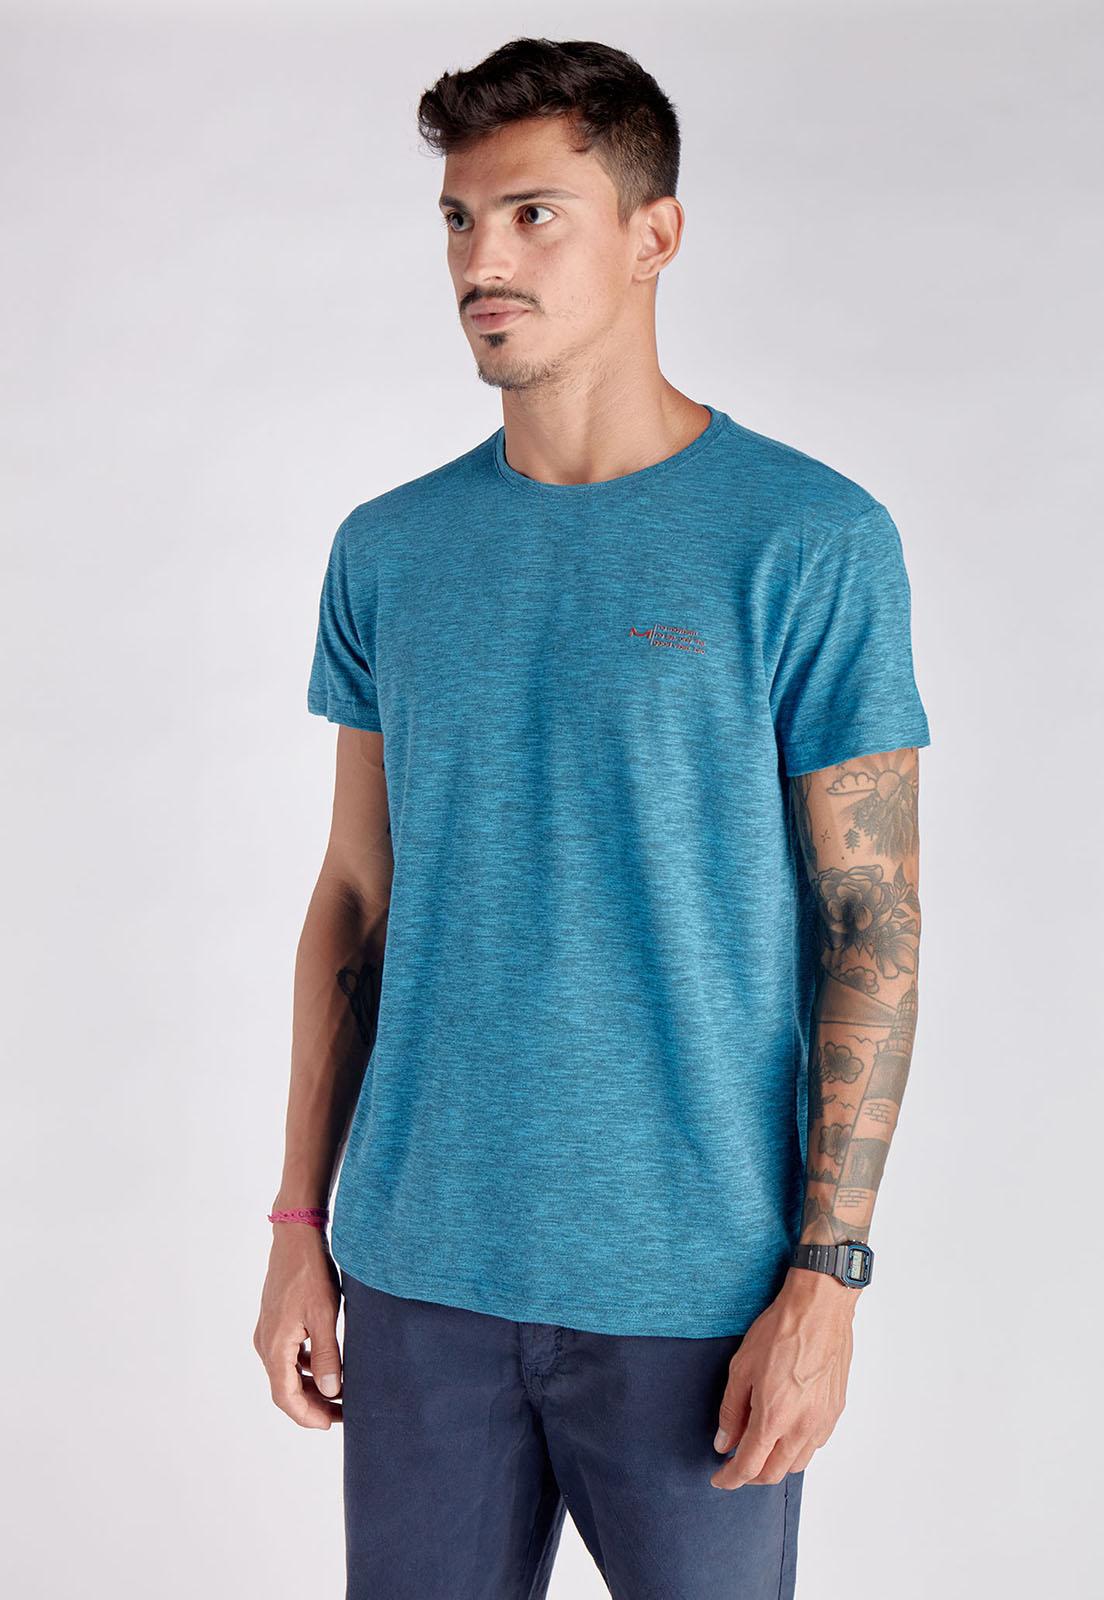 T-shirt Blue Melty